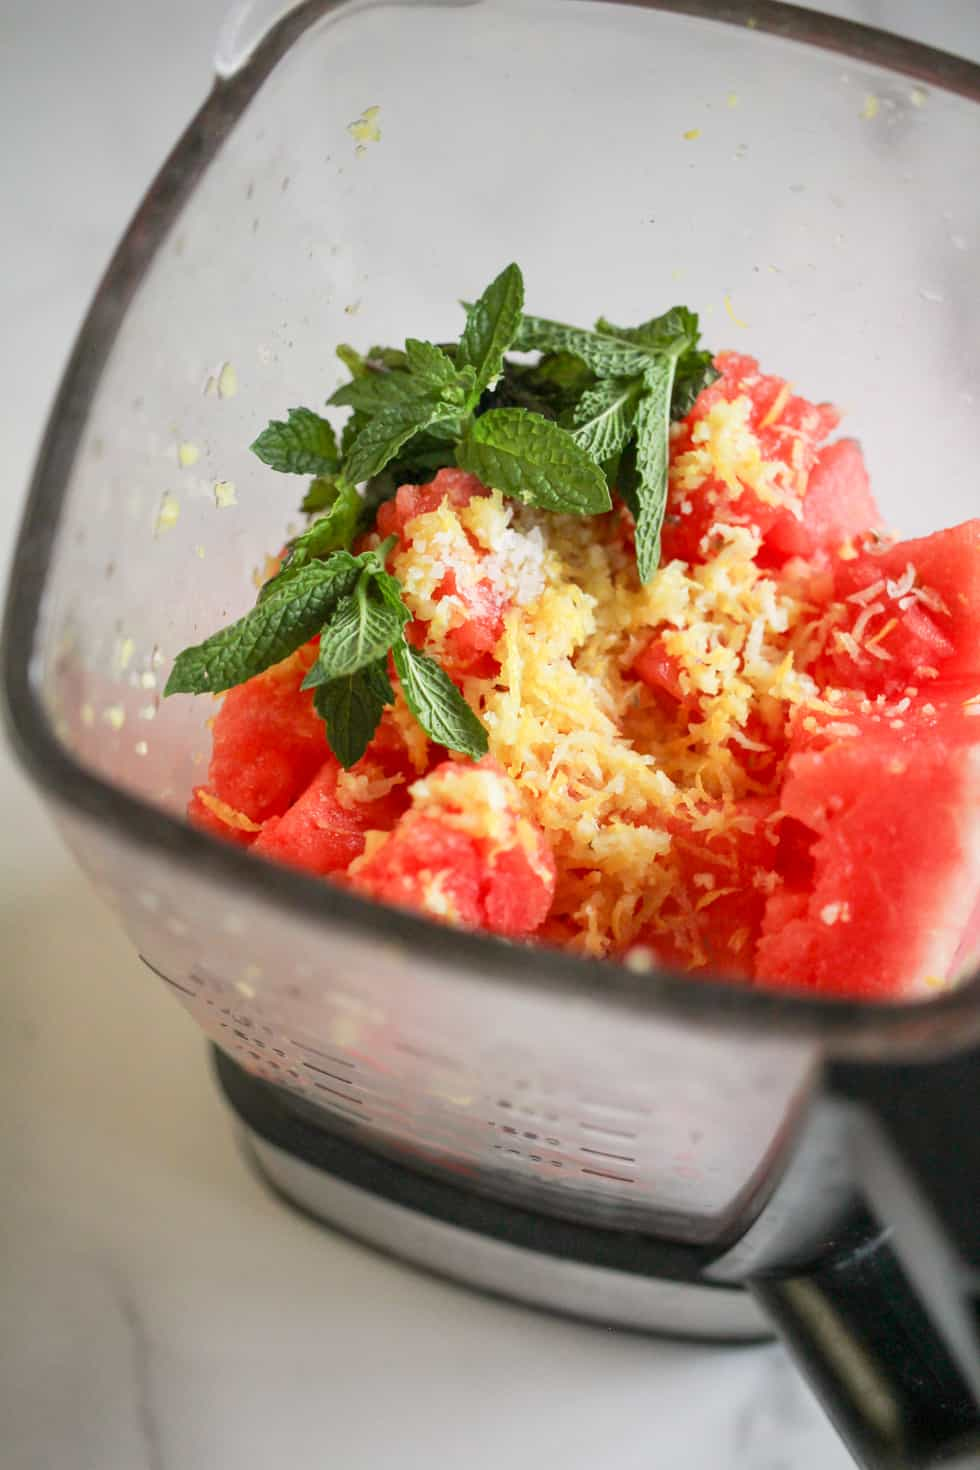 Blender filled with watermelon, lemon zest, and fresh mint.